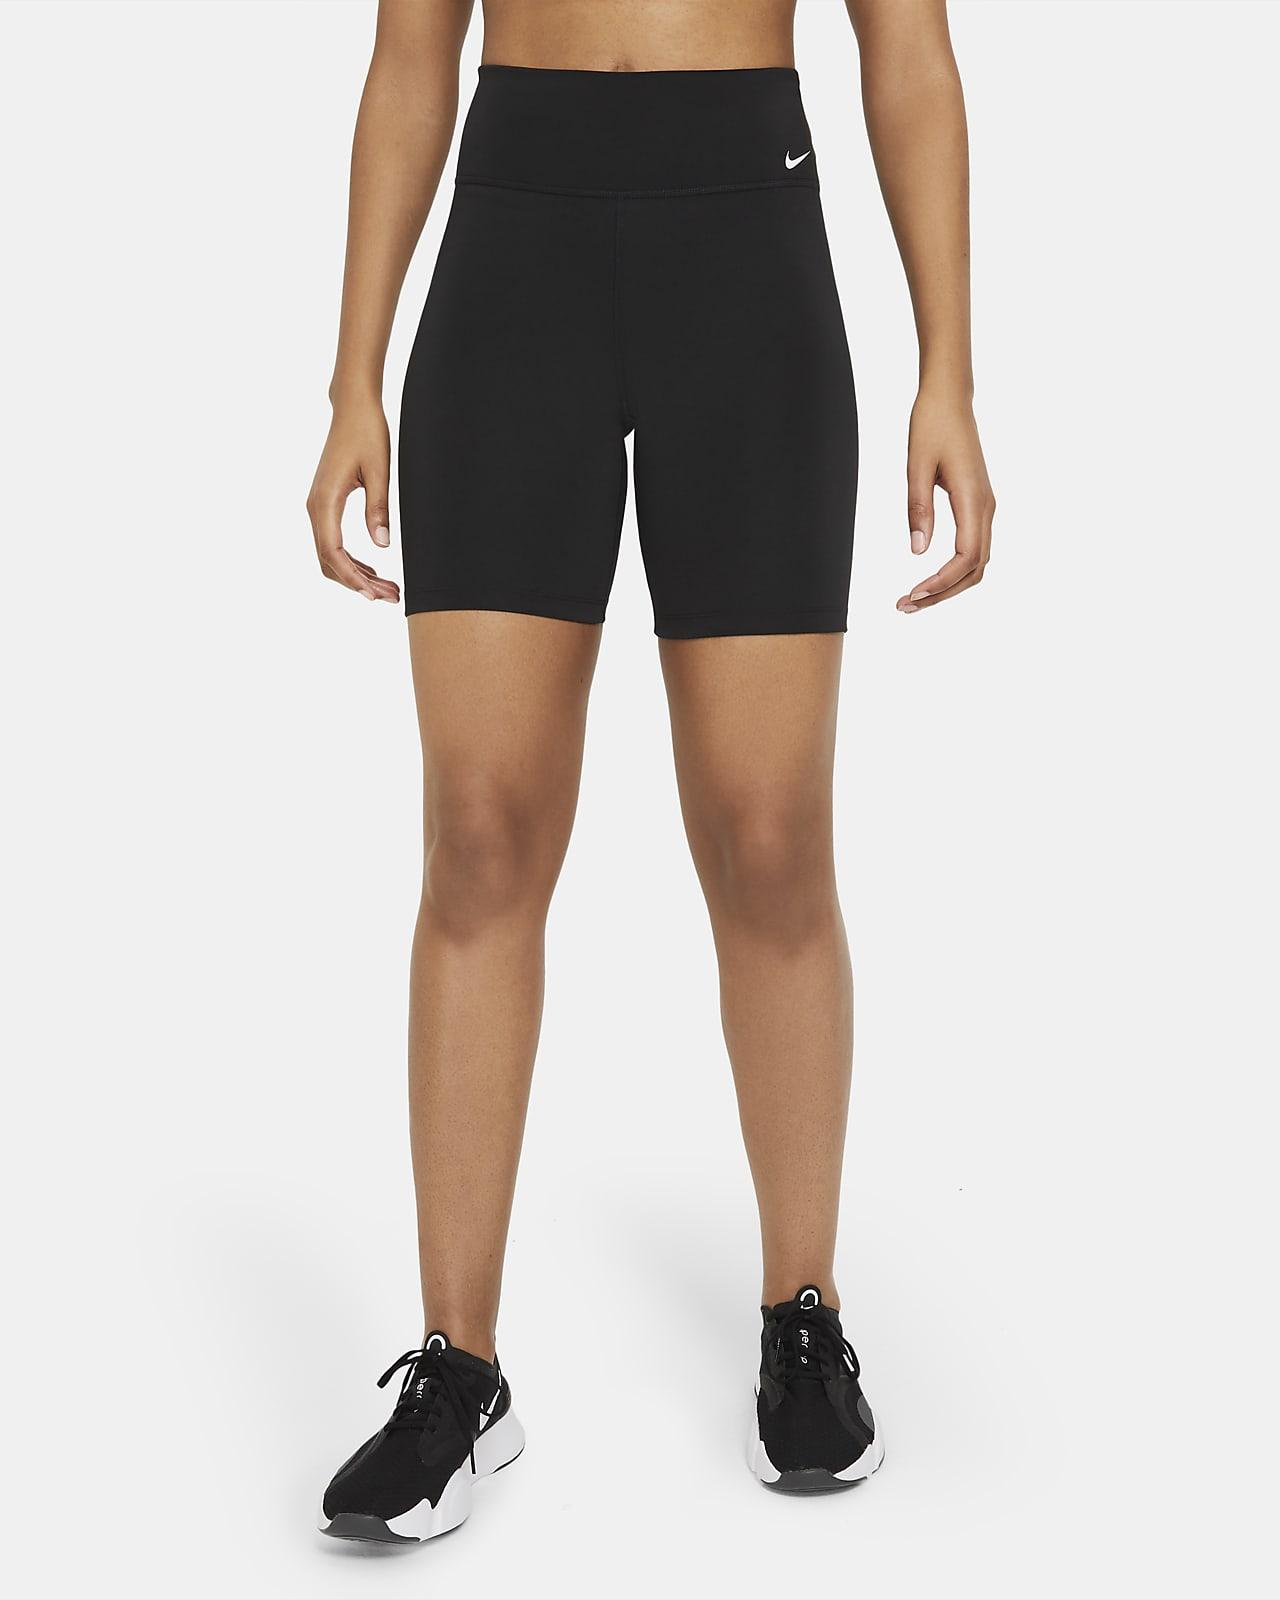 Shorts de 18 cm y tiro medio para mujer Nike One